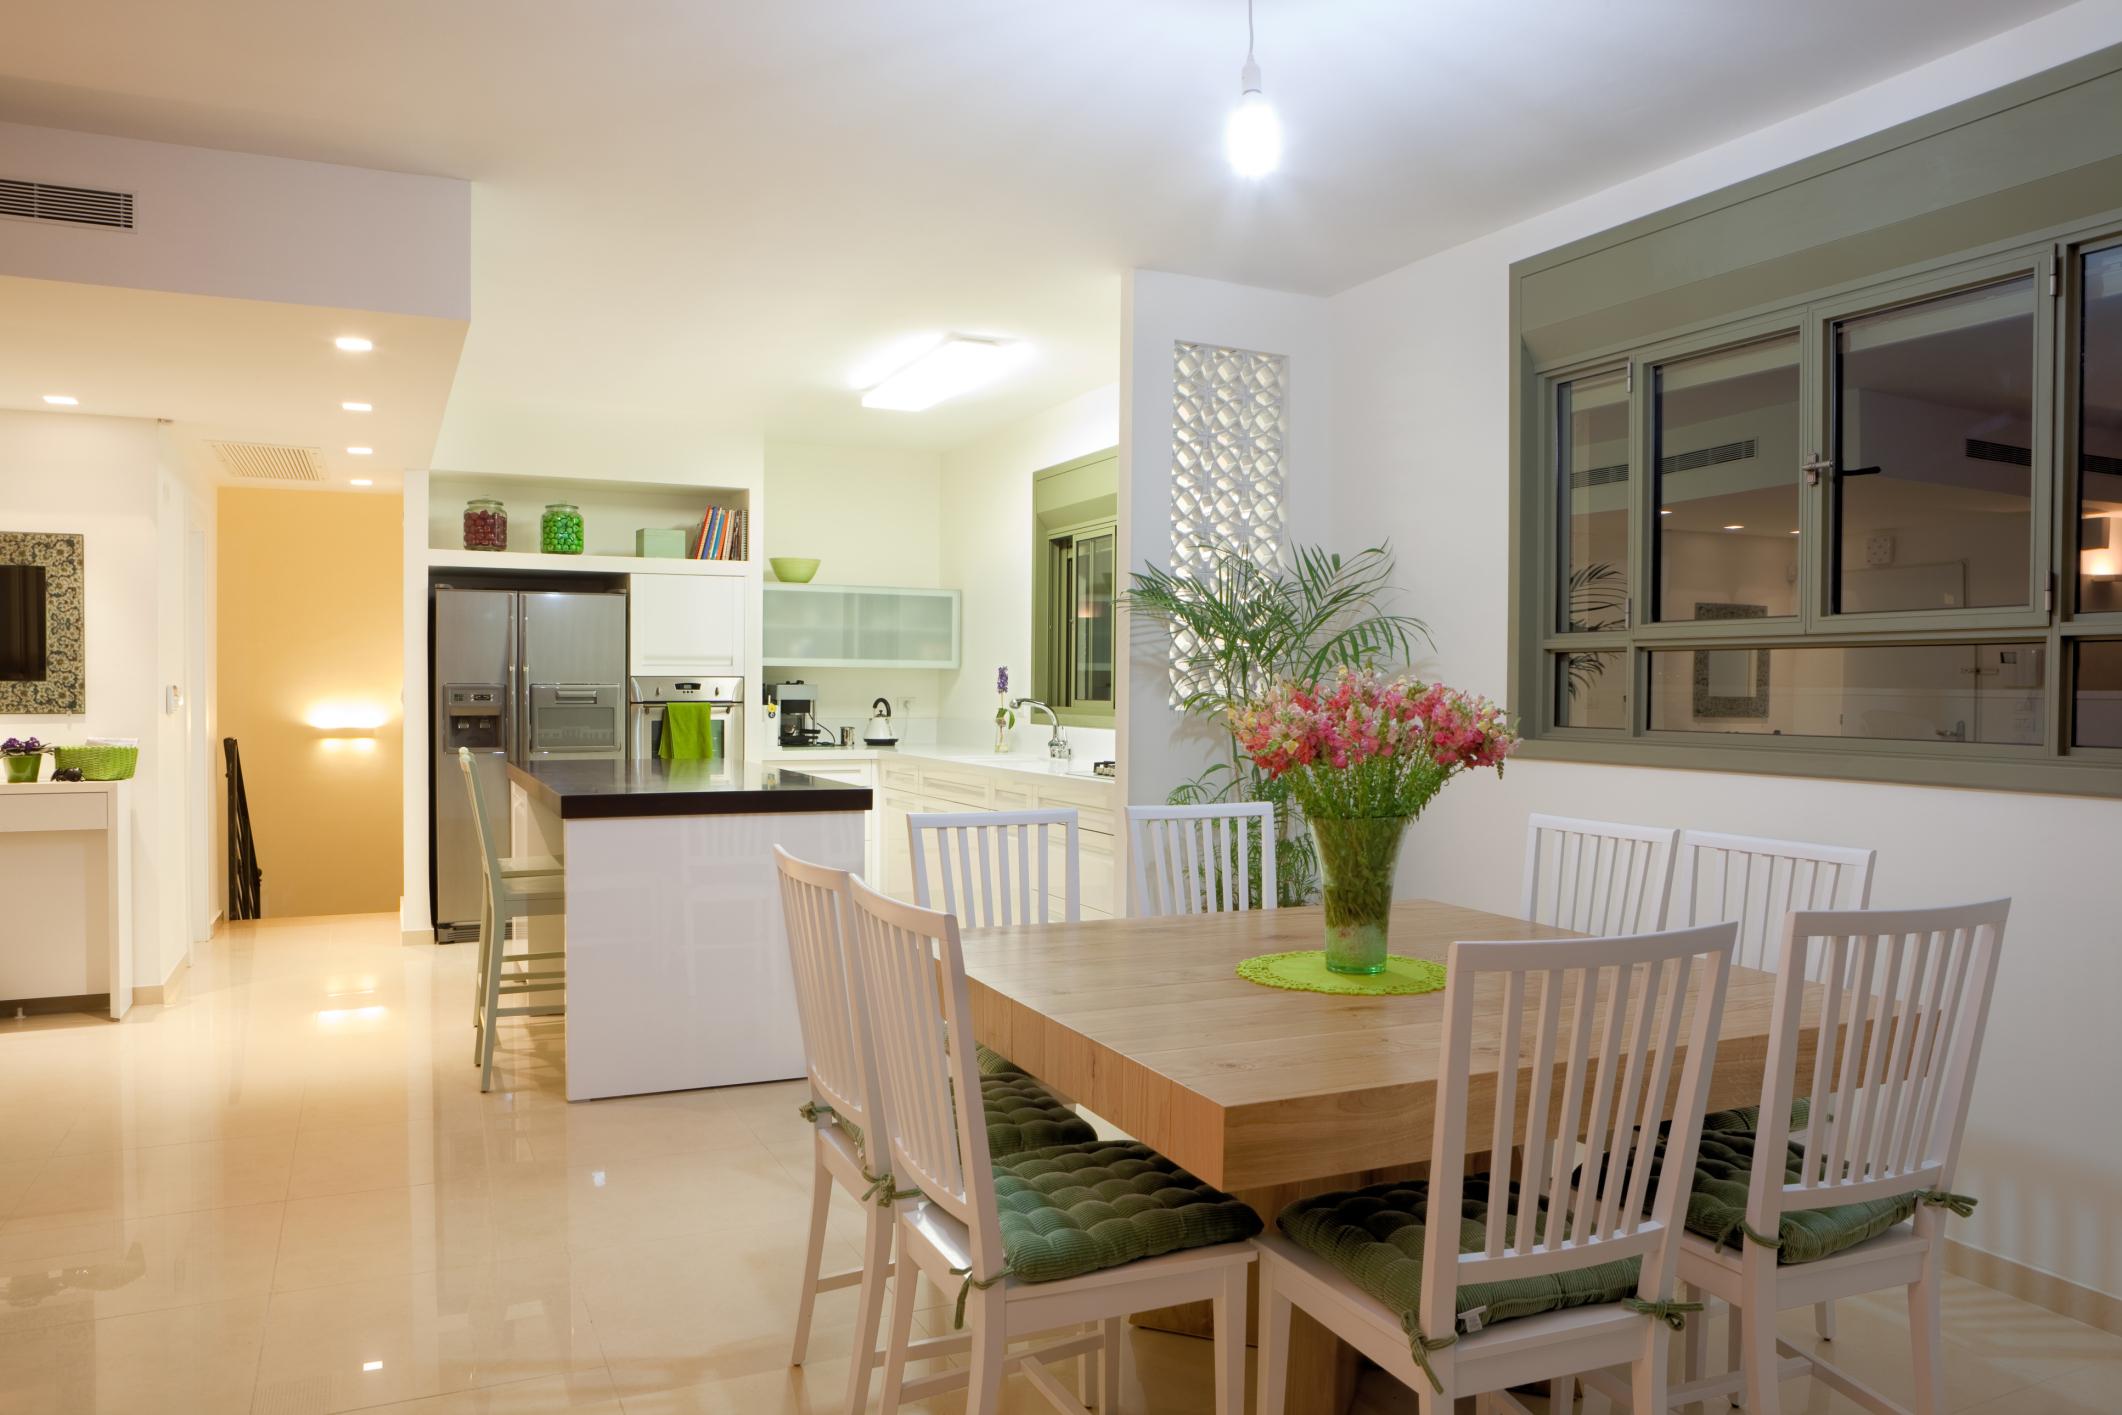 interior remodeling kitchen remodeling york pa